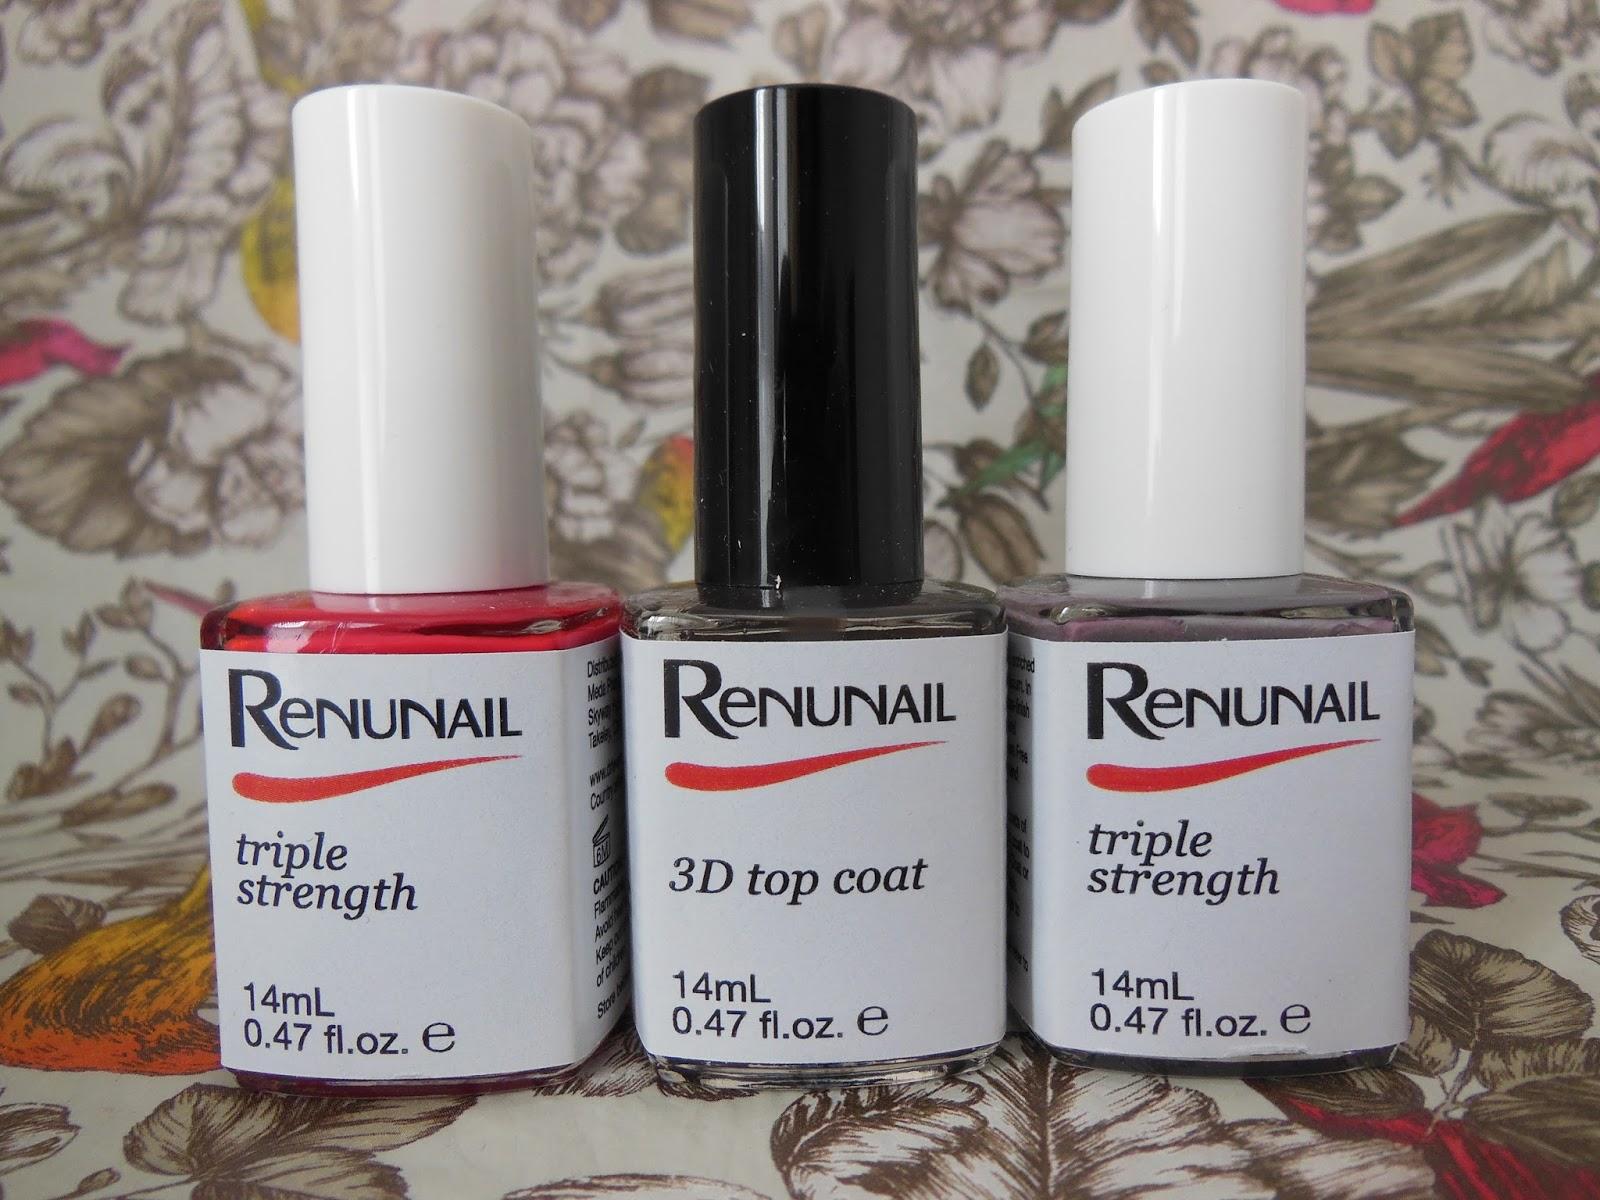 Dr Lewinn's renunail triple strength nail colours